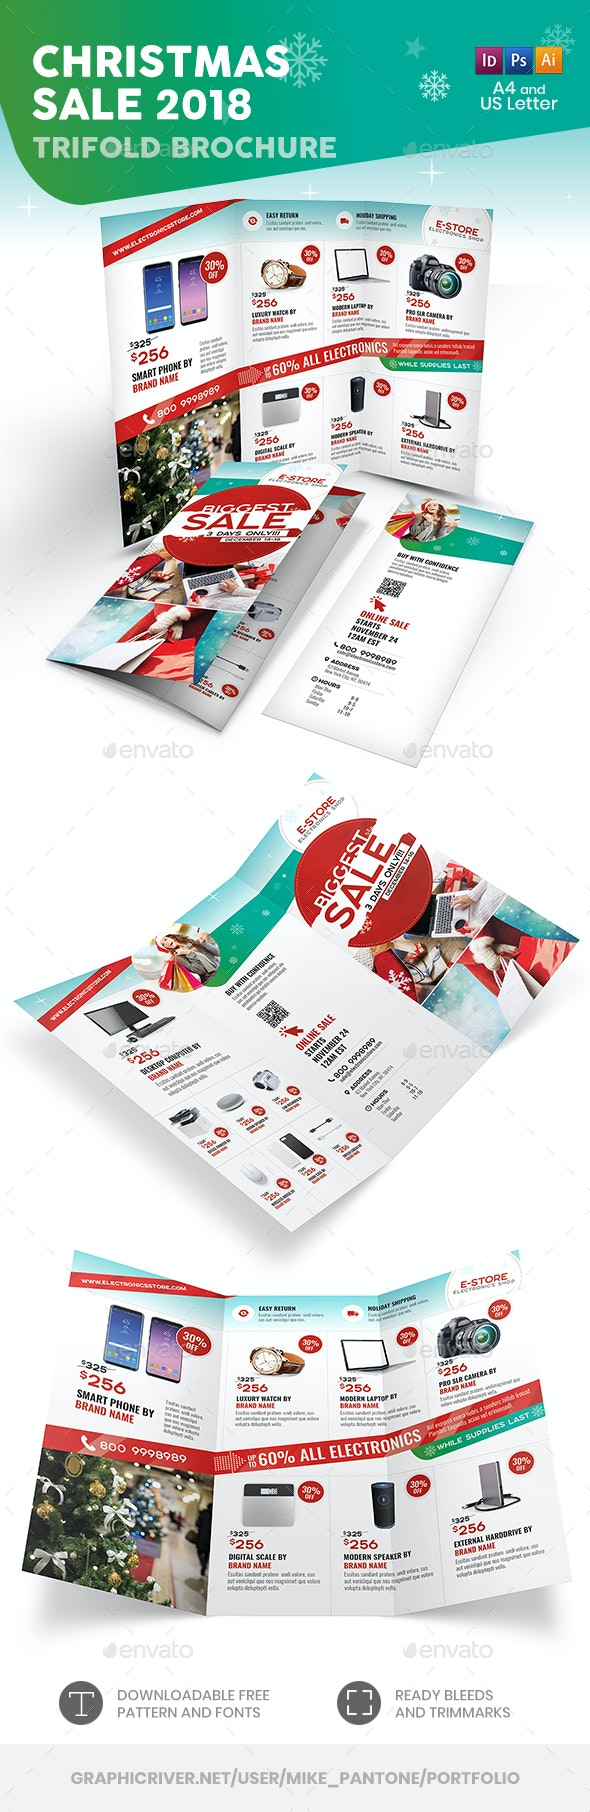 Christmas Sale 2018 Trifold Brochure - Informational Brochures